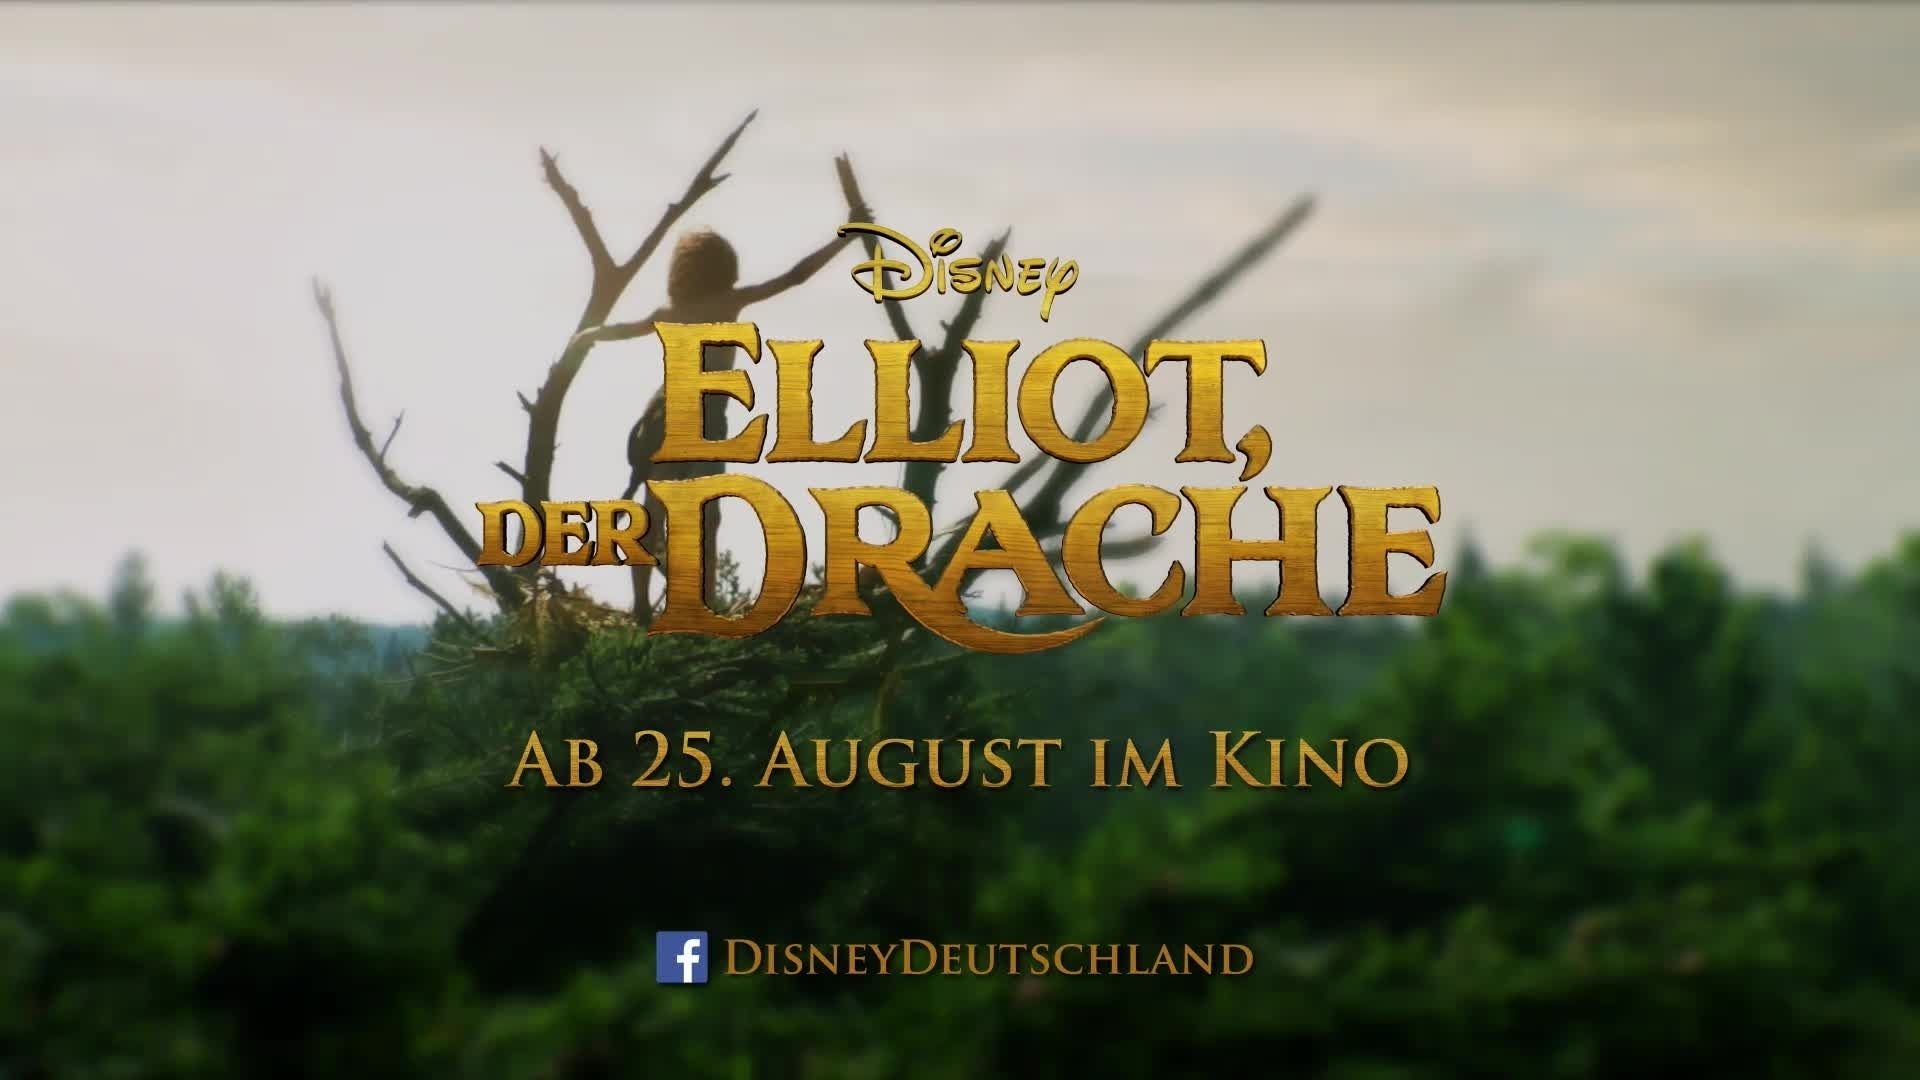 ELLIOT, DER DRACHE - Teaser-Trailer